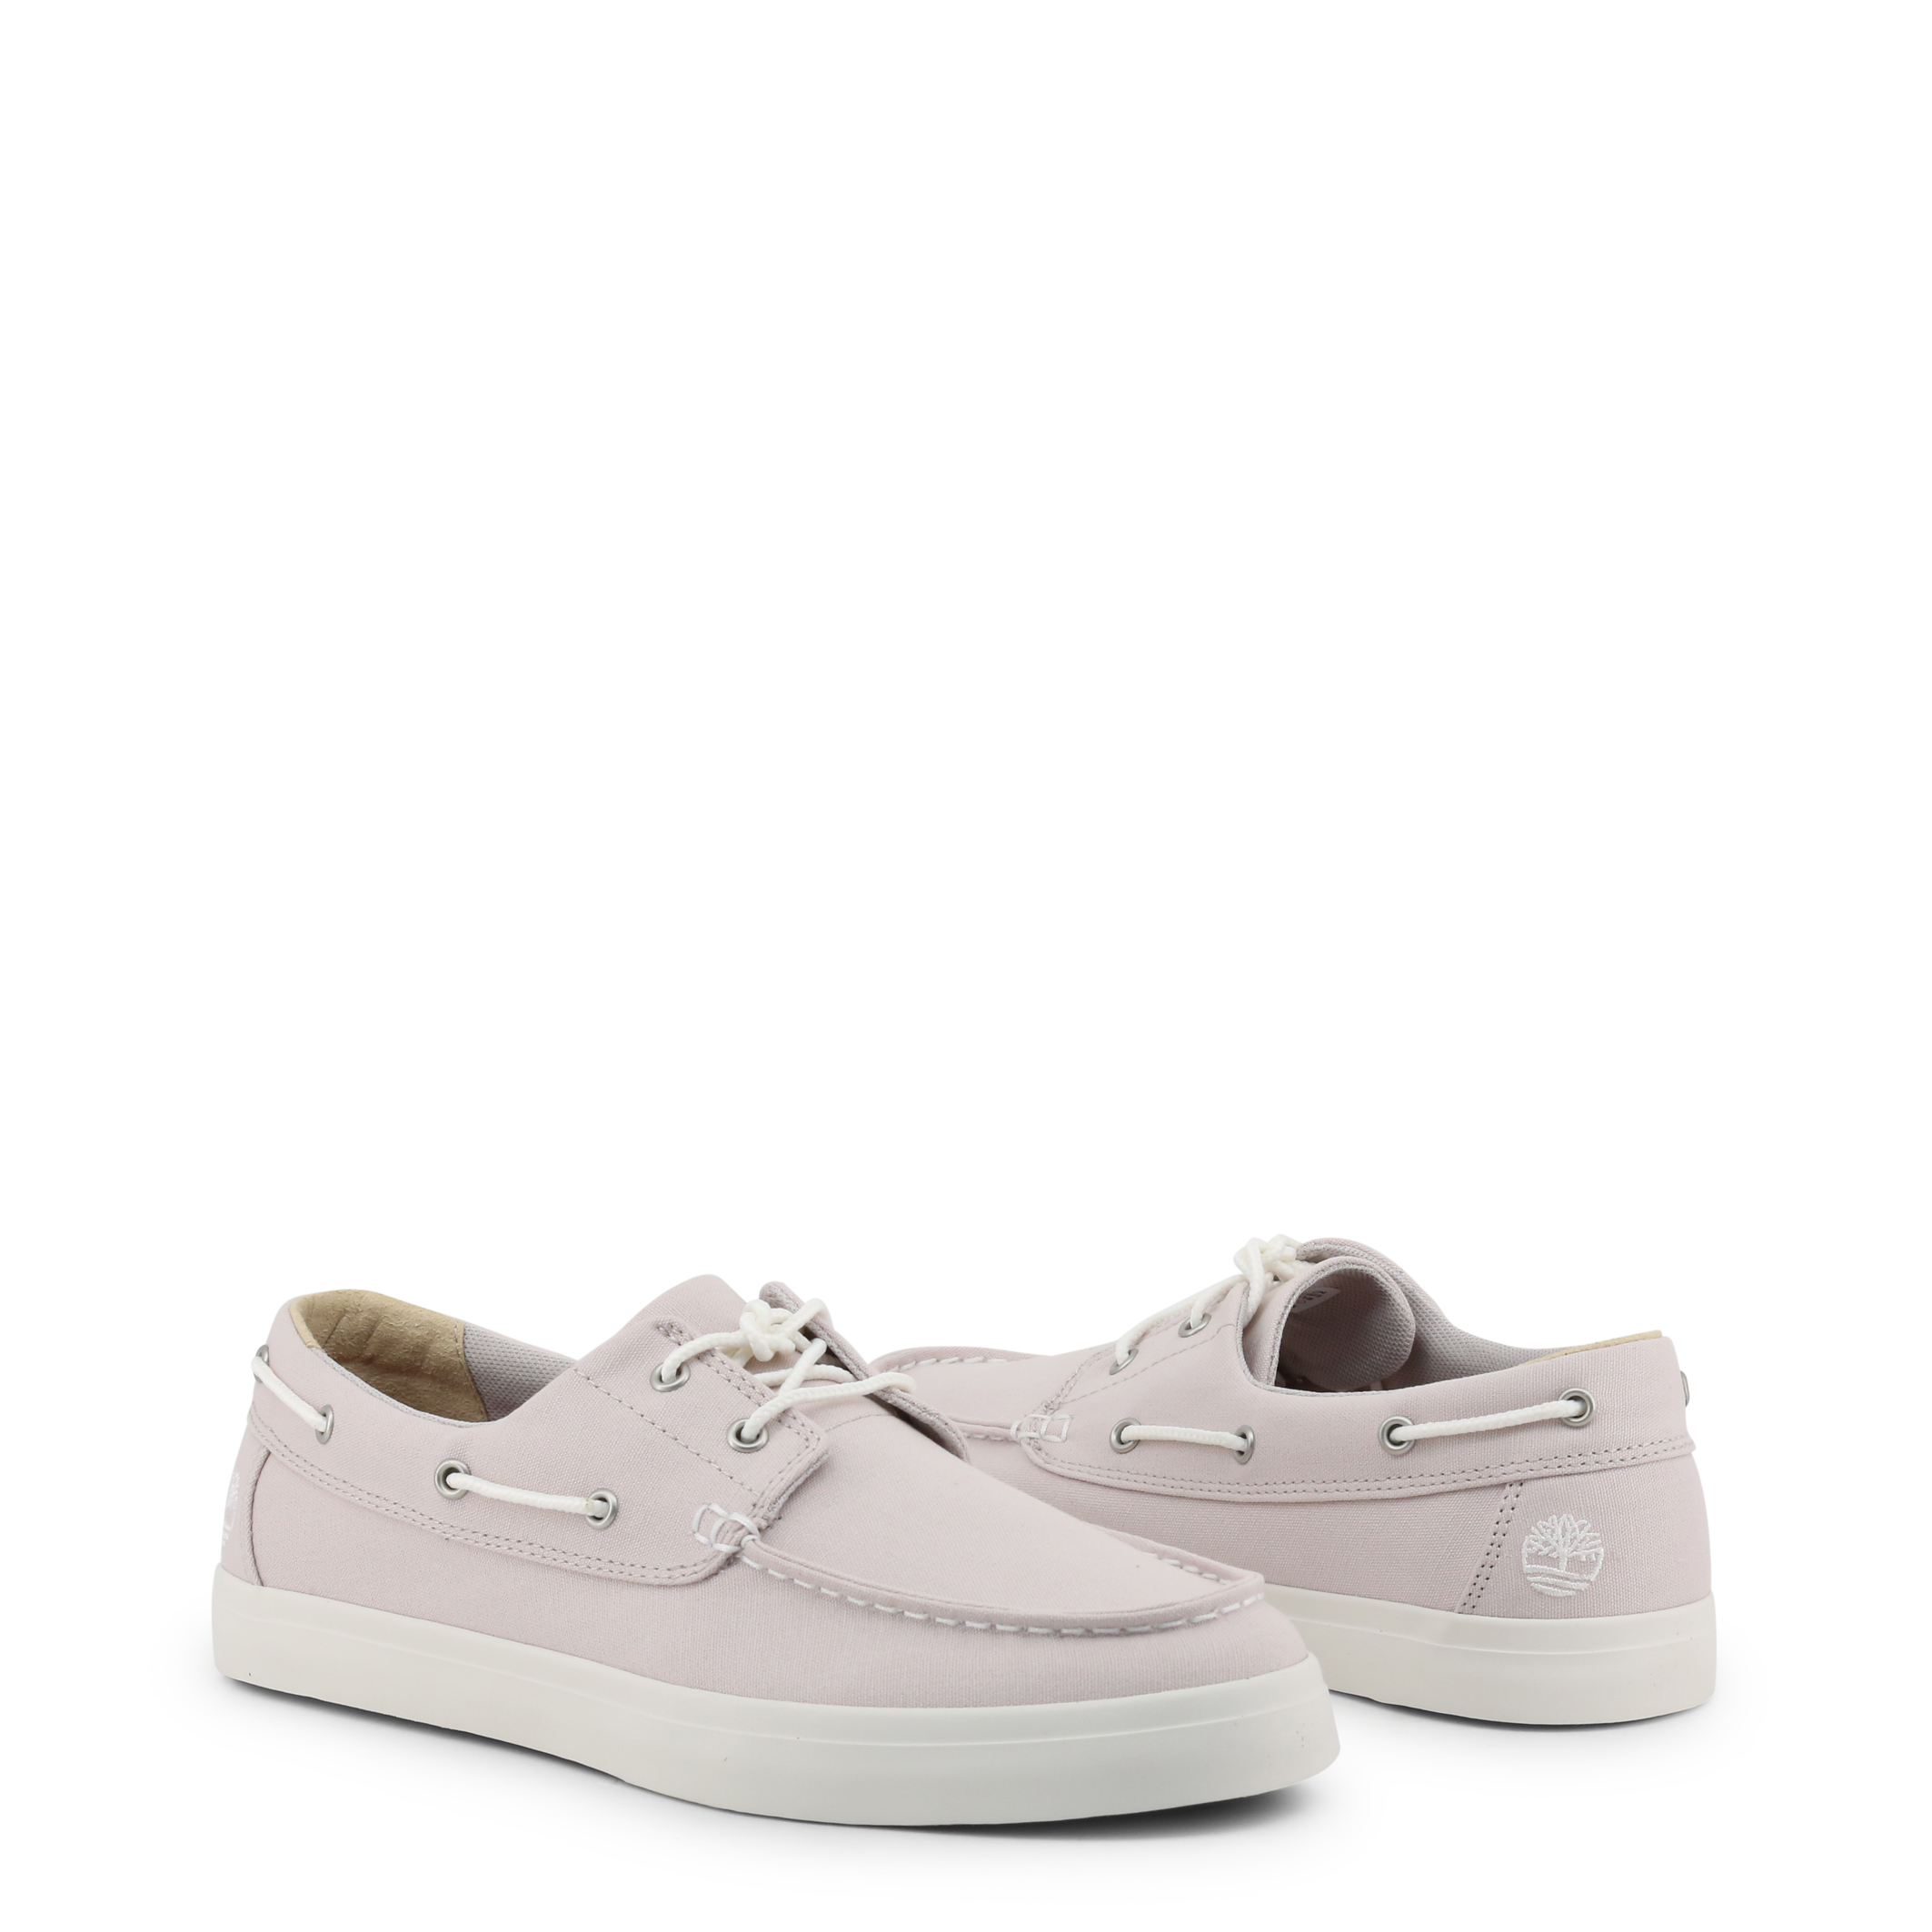 Chaussures   Timberland UNIONWHARF grey